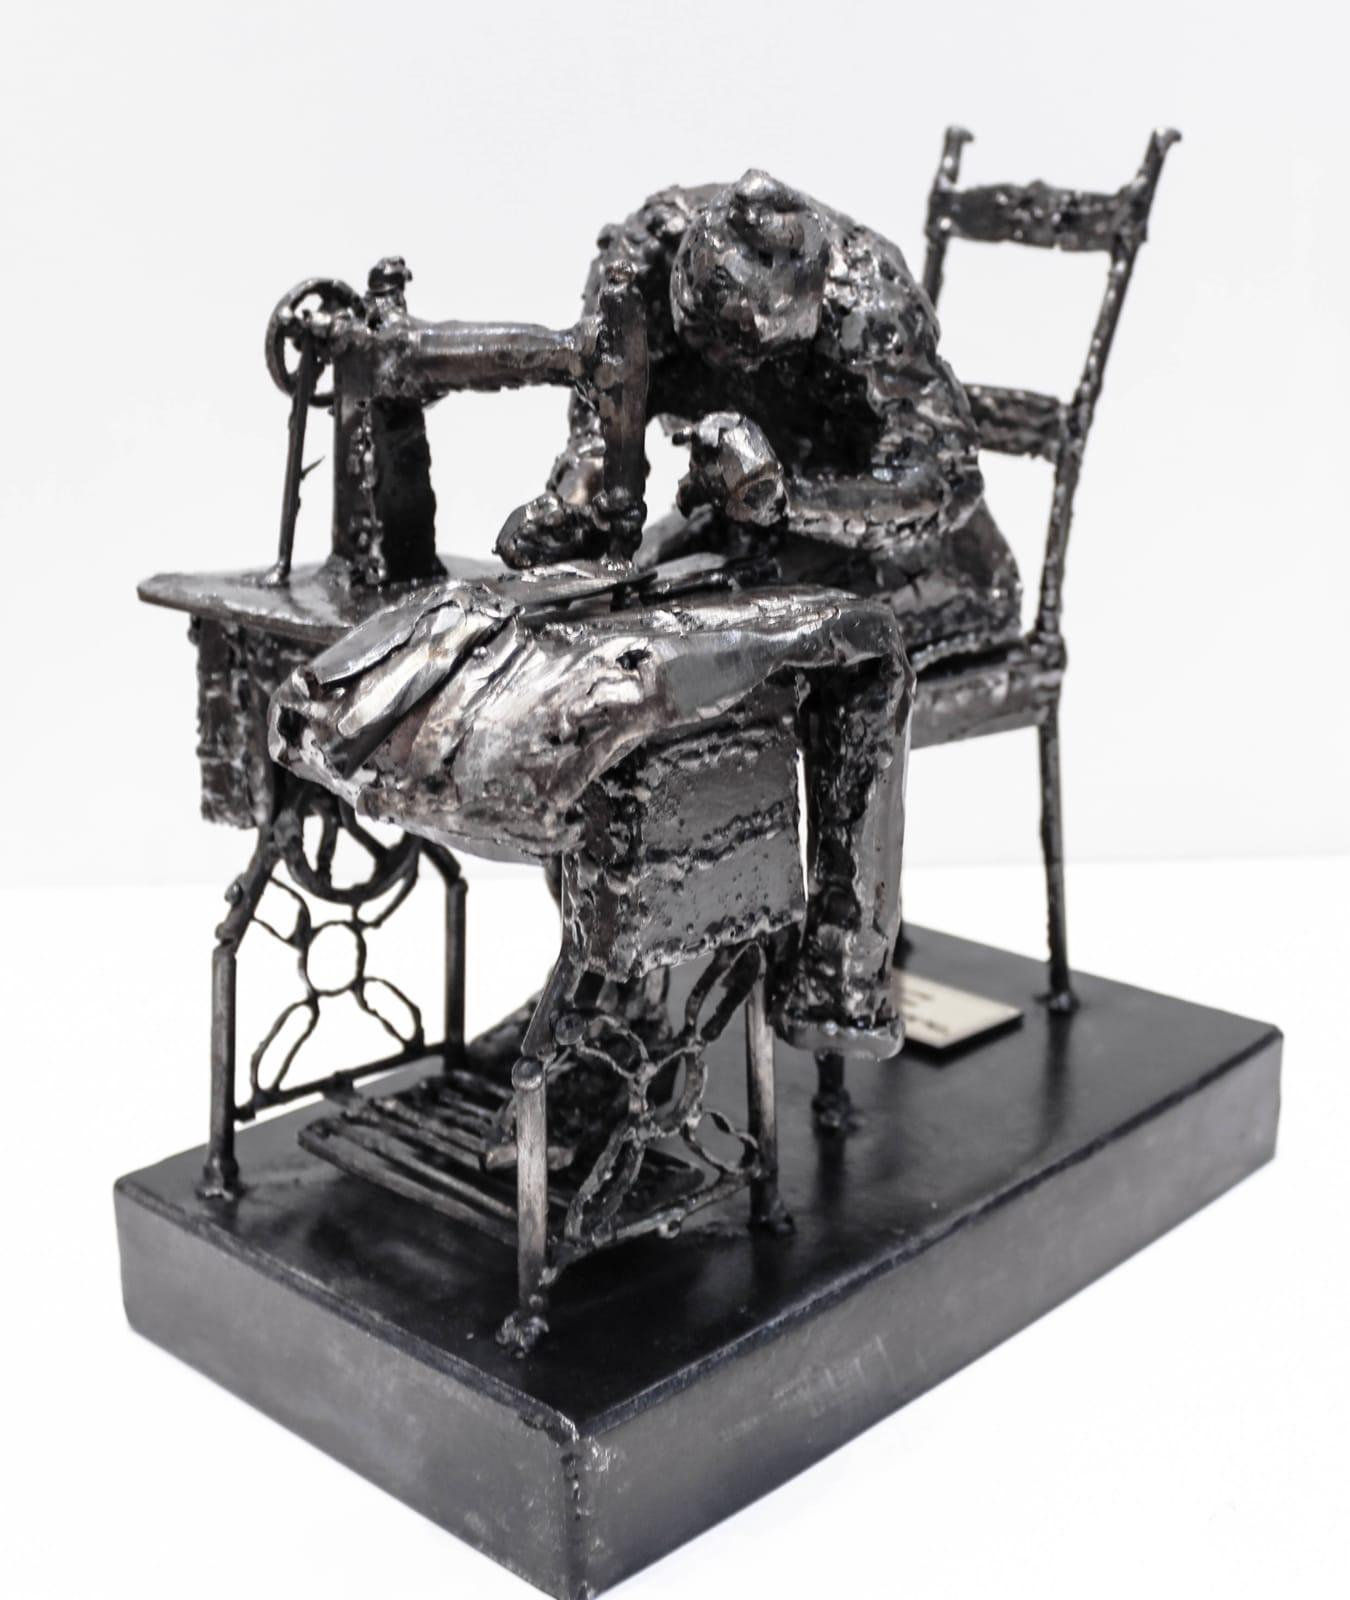 Gert Potgieter, The Sewing Machine, 2016